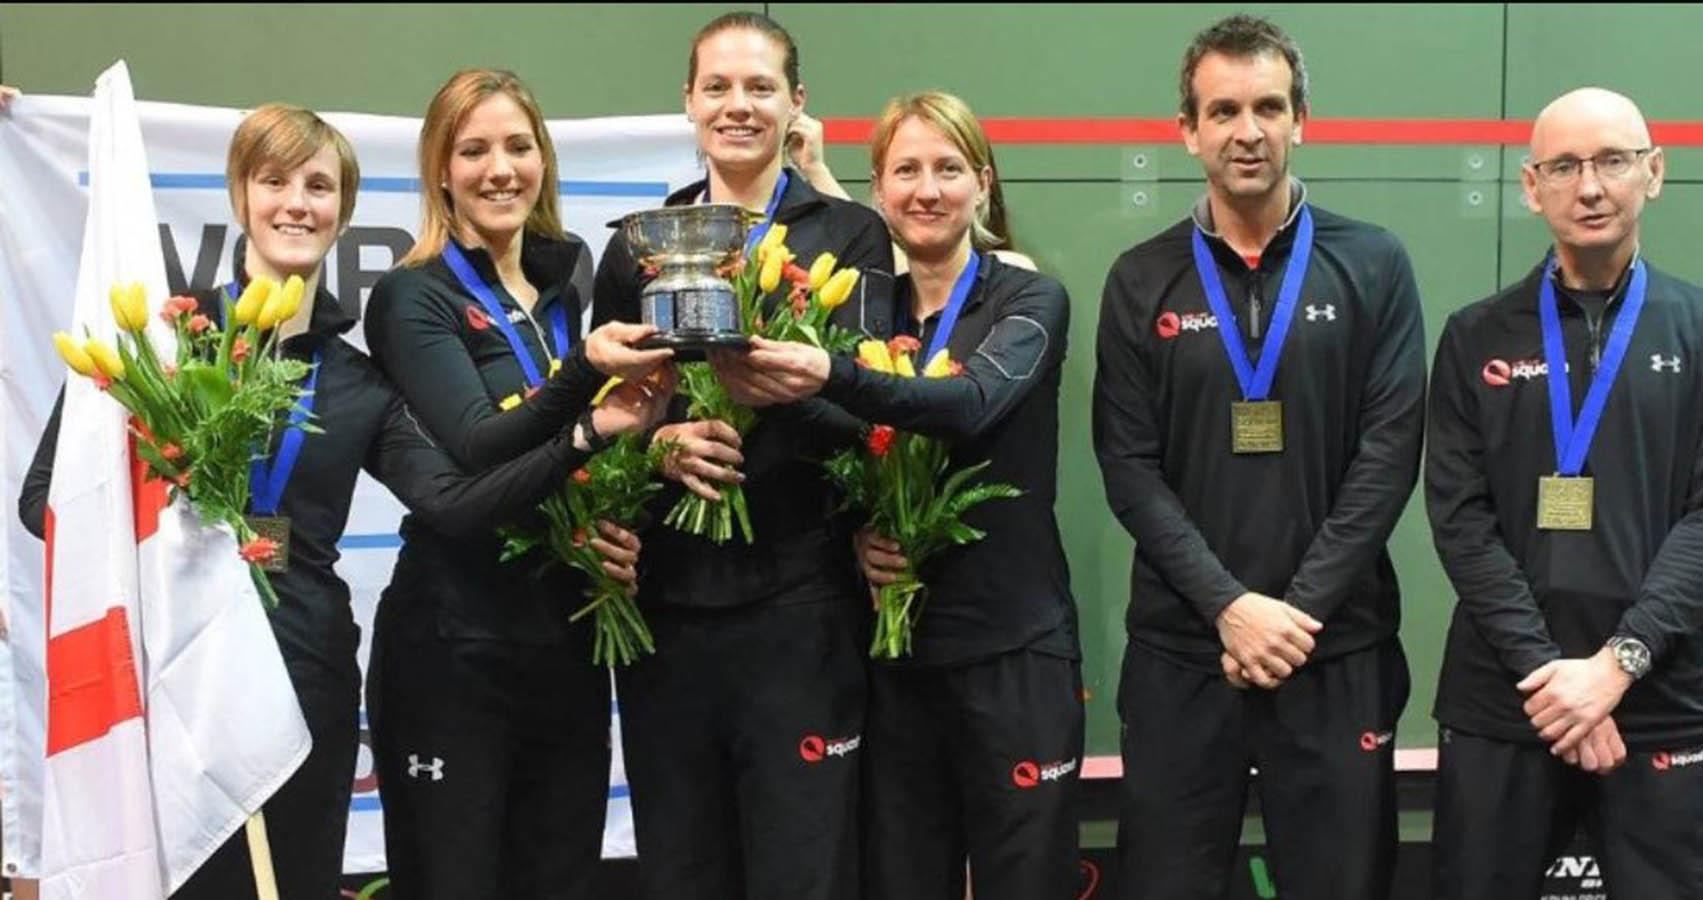 European  Senior Team Squash Champions 2016, Team England